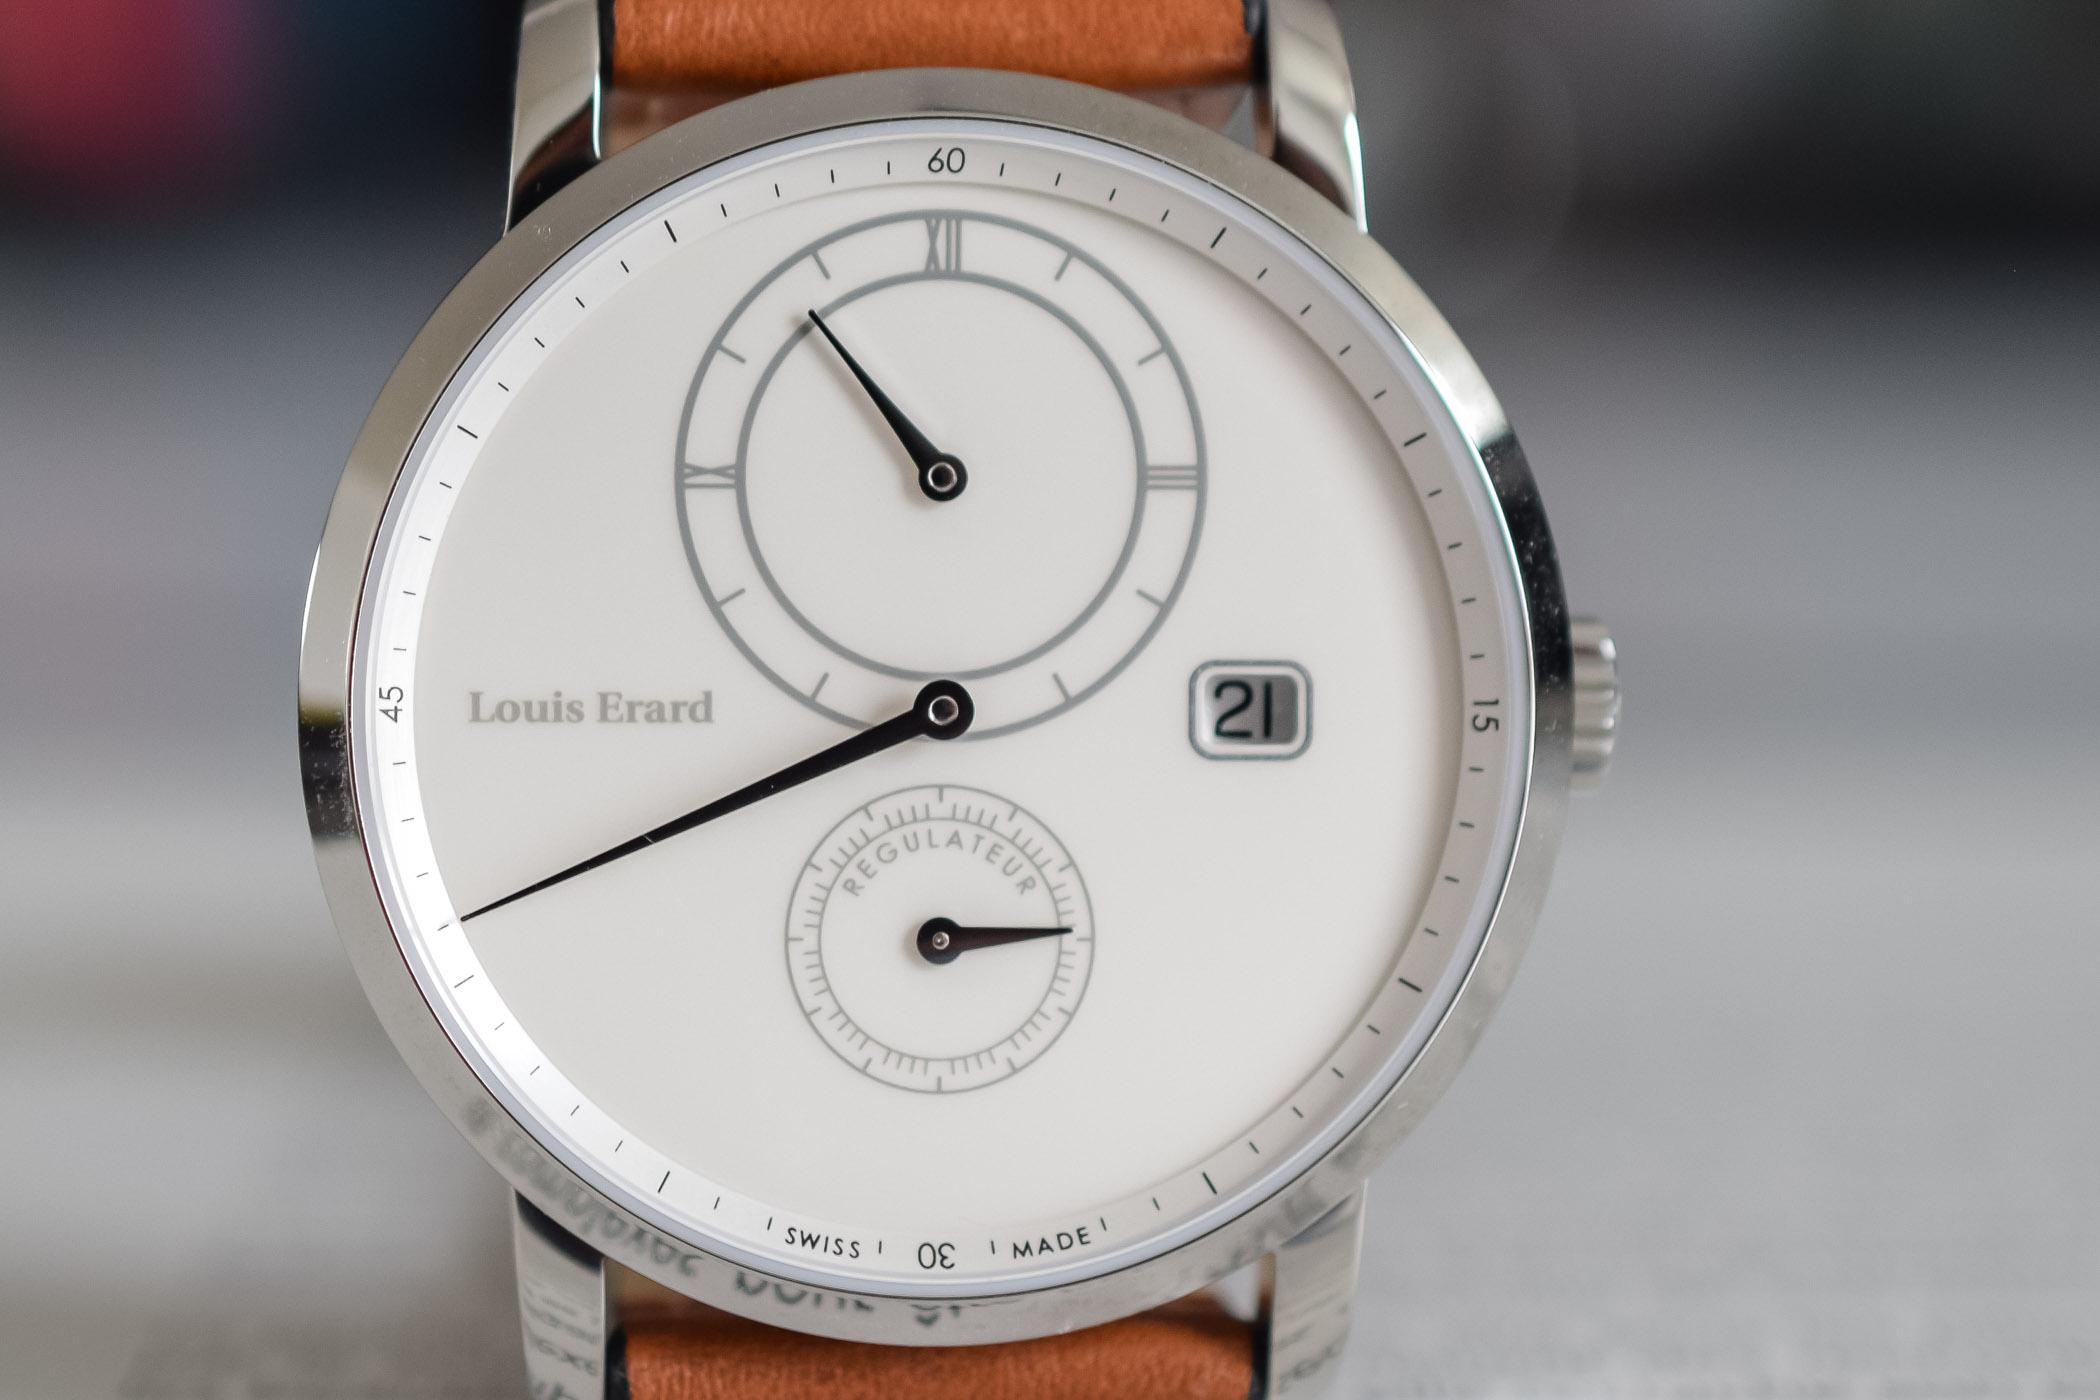 Louis Erard Excellence Regulator - Design Eric Giroud